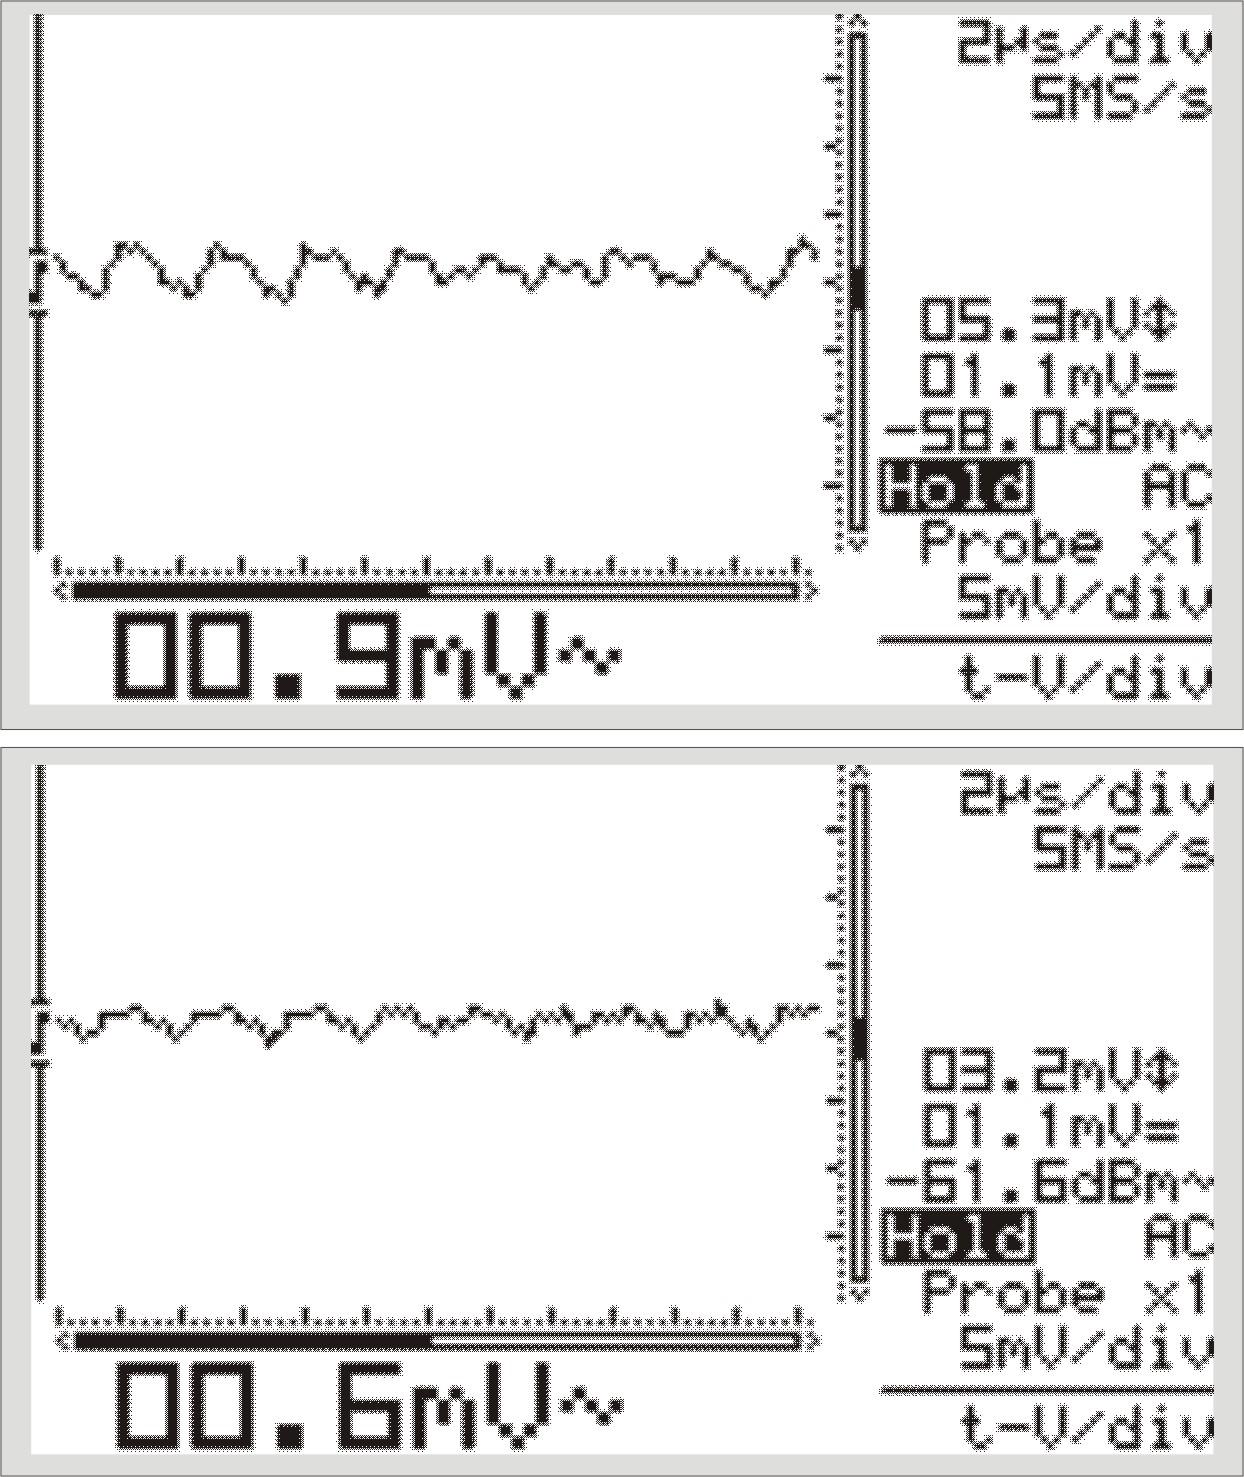 Pic En Zenerdiode Forum Circuits Online Led Circuit Calculator Http Wwwcircuitsonlinenet Download 48 Uploadarchiefnet Files Rommel